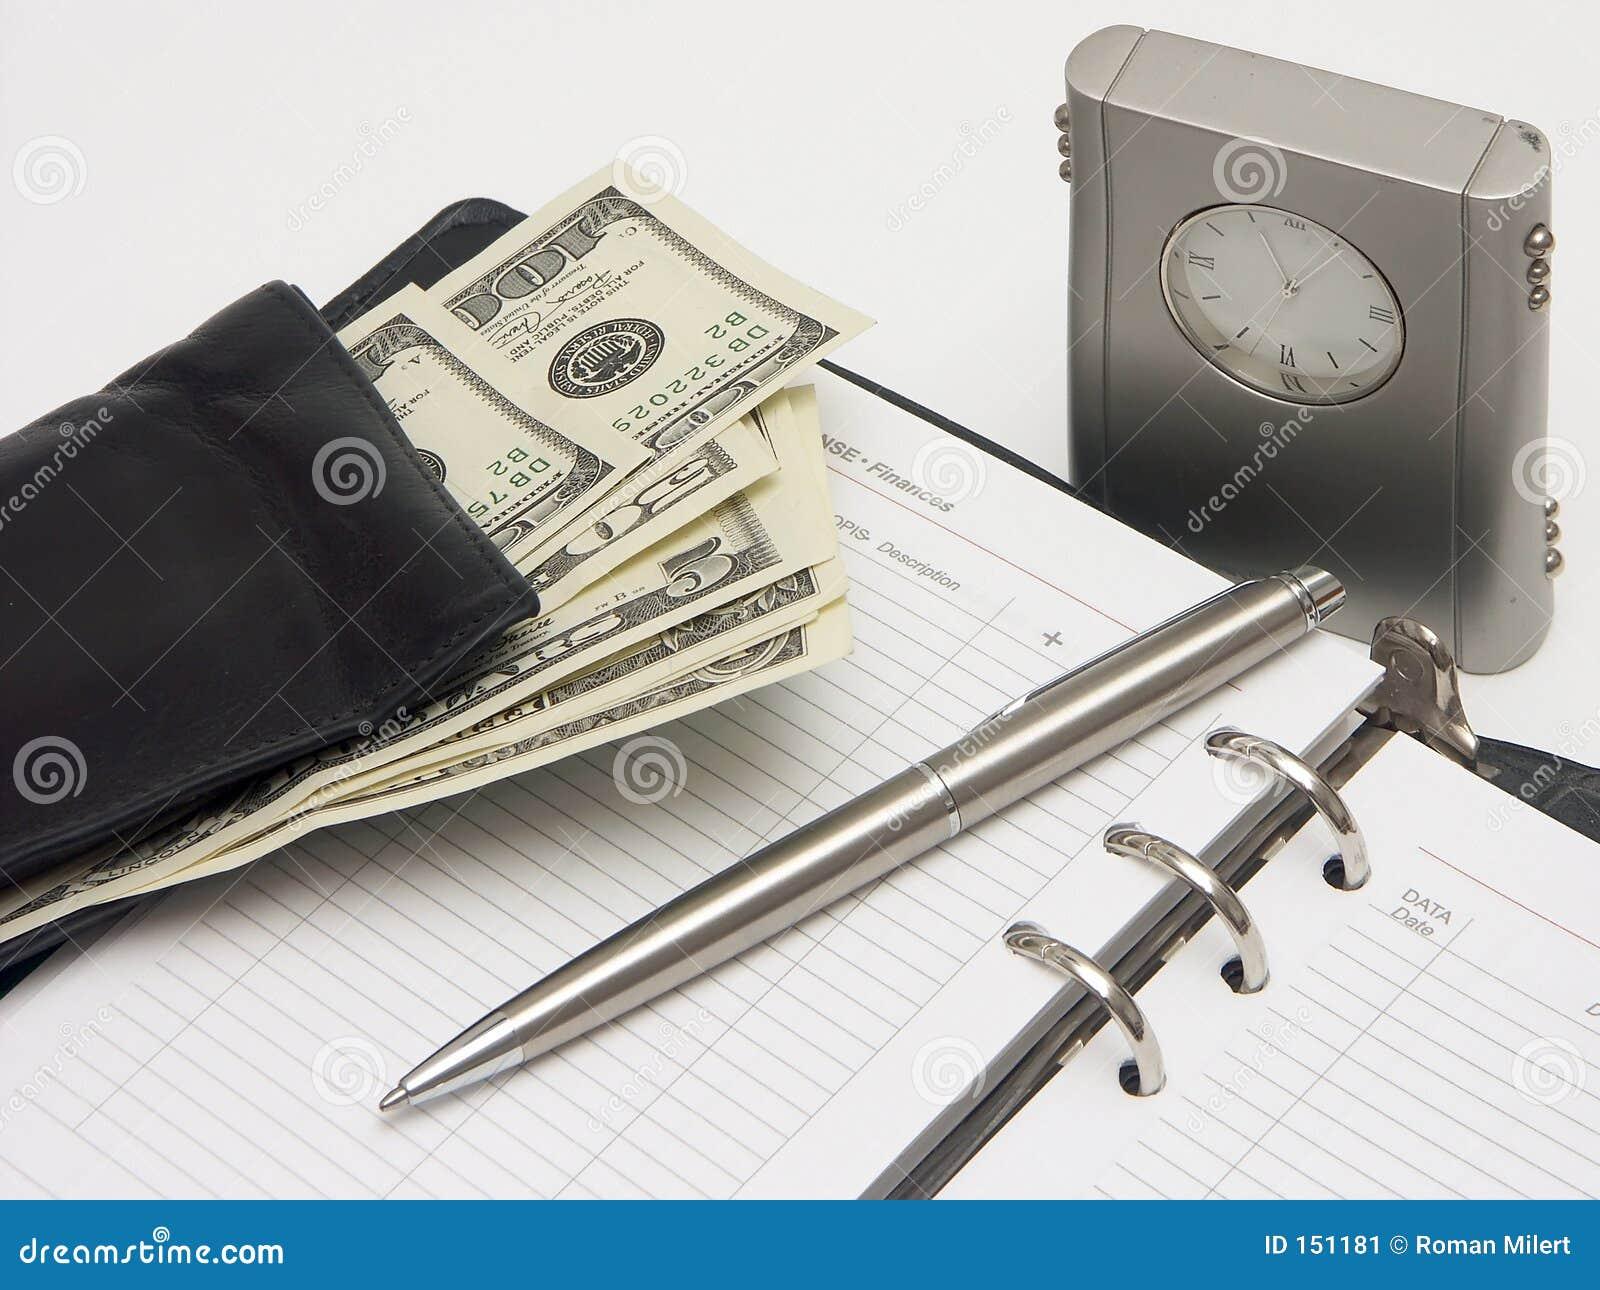 Planning expenditures